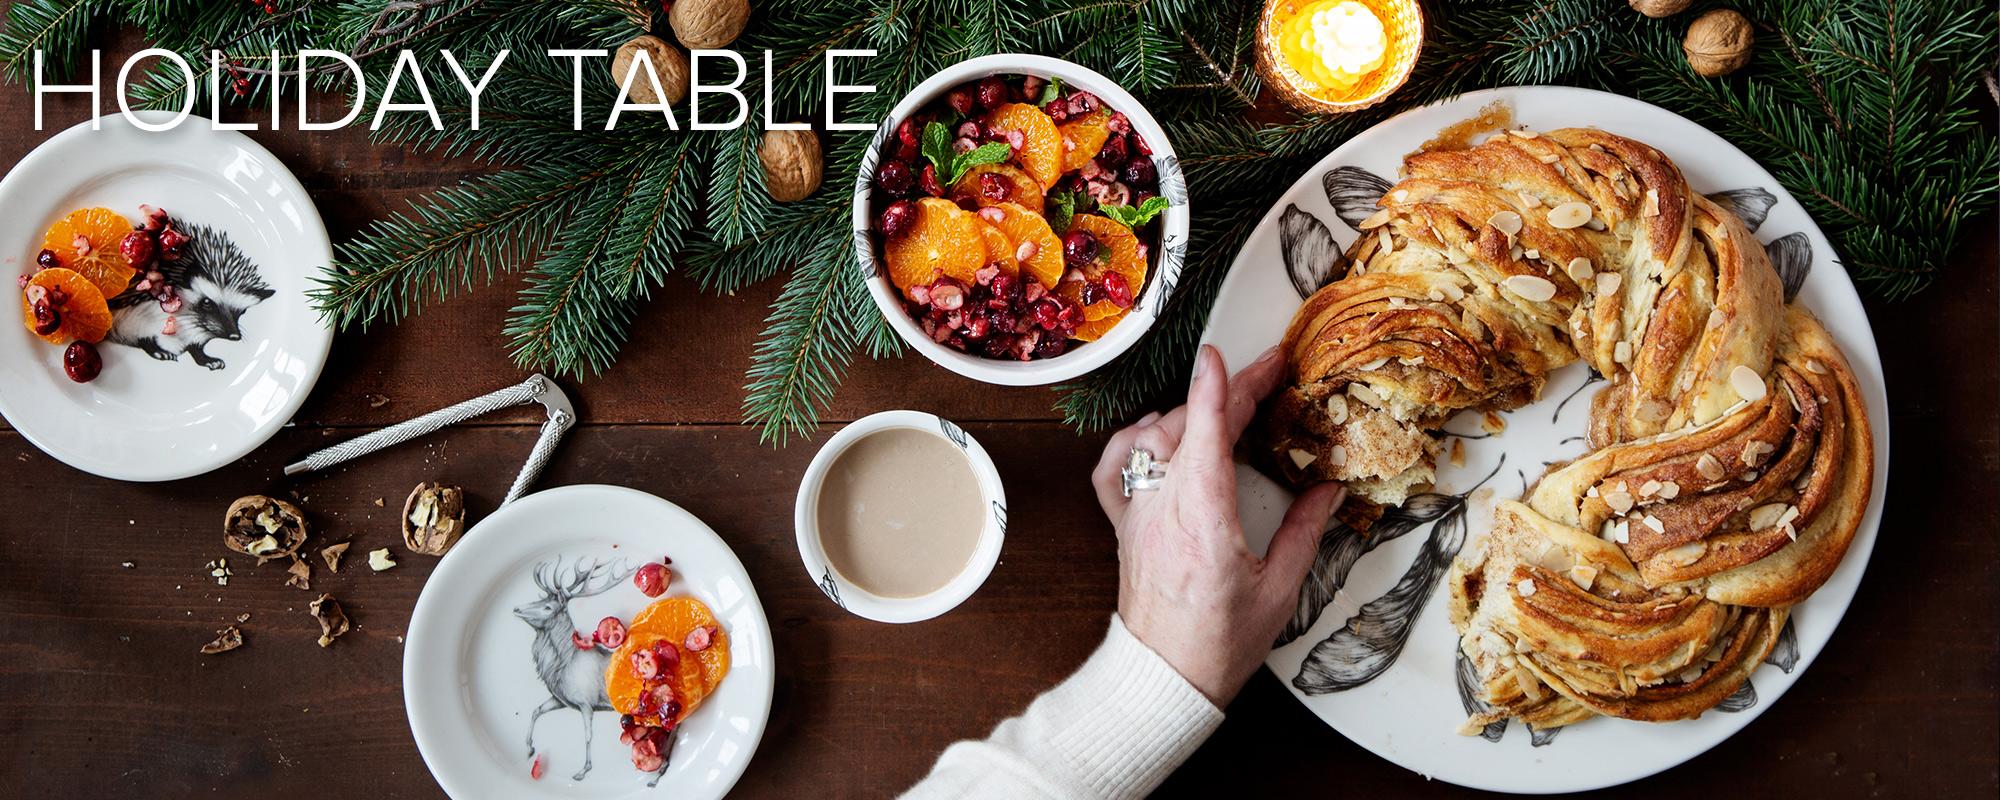 Holiday Tableware laura Zindel